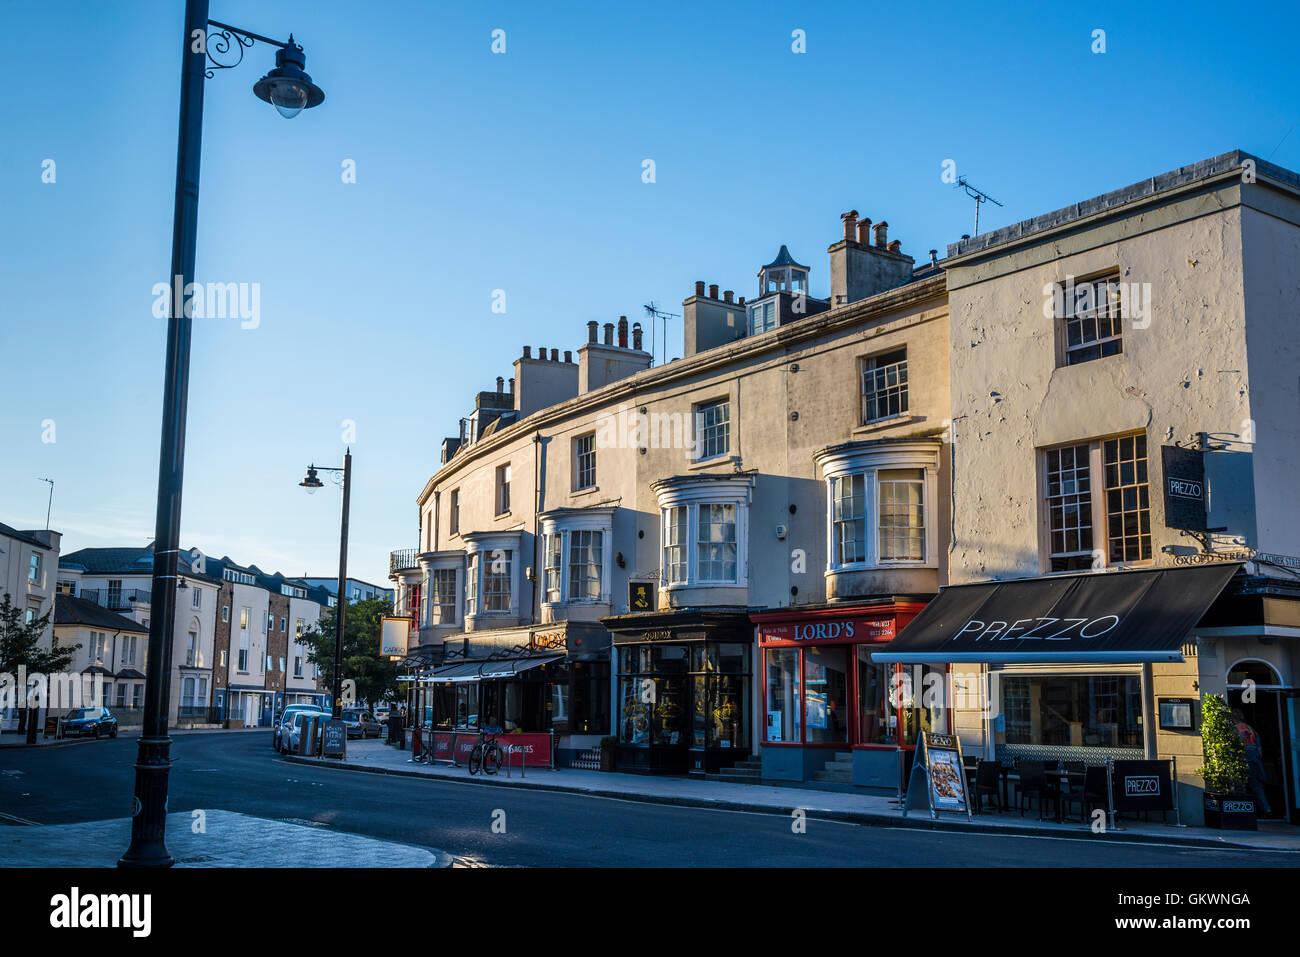 Restaurants in Oxford Street, Southampton, Hampshire, England, UK - Stock Image